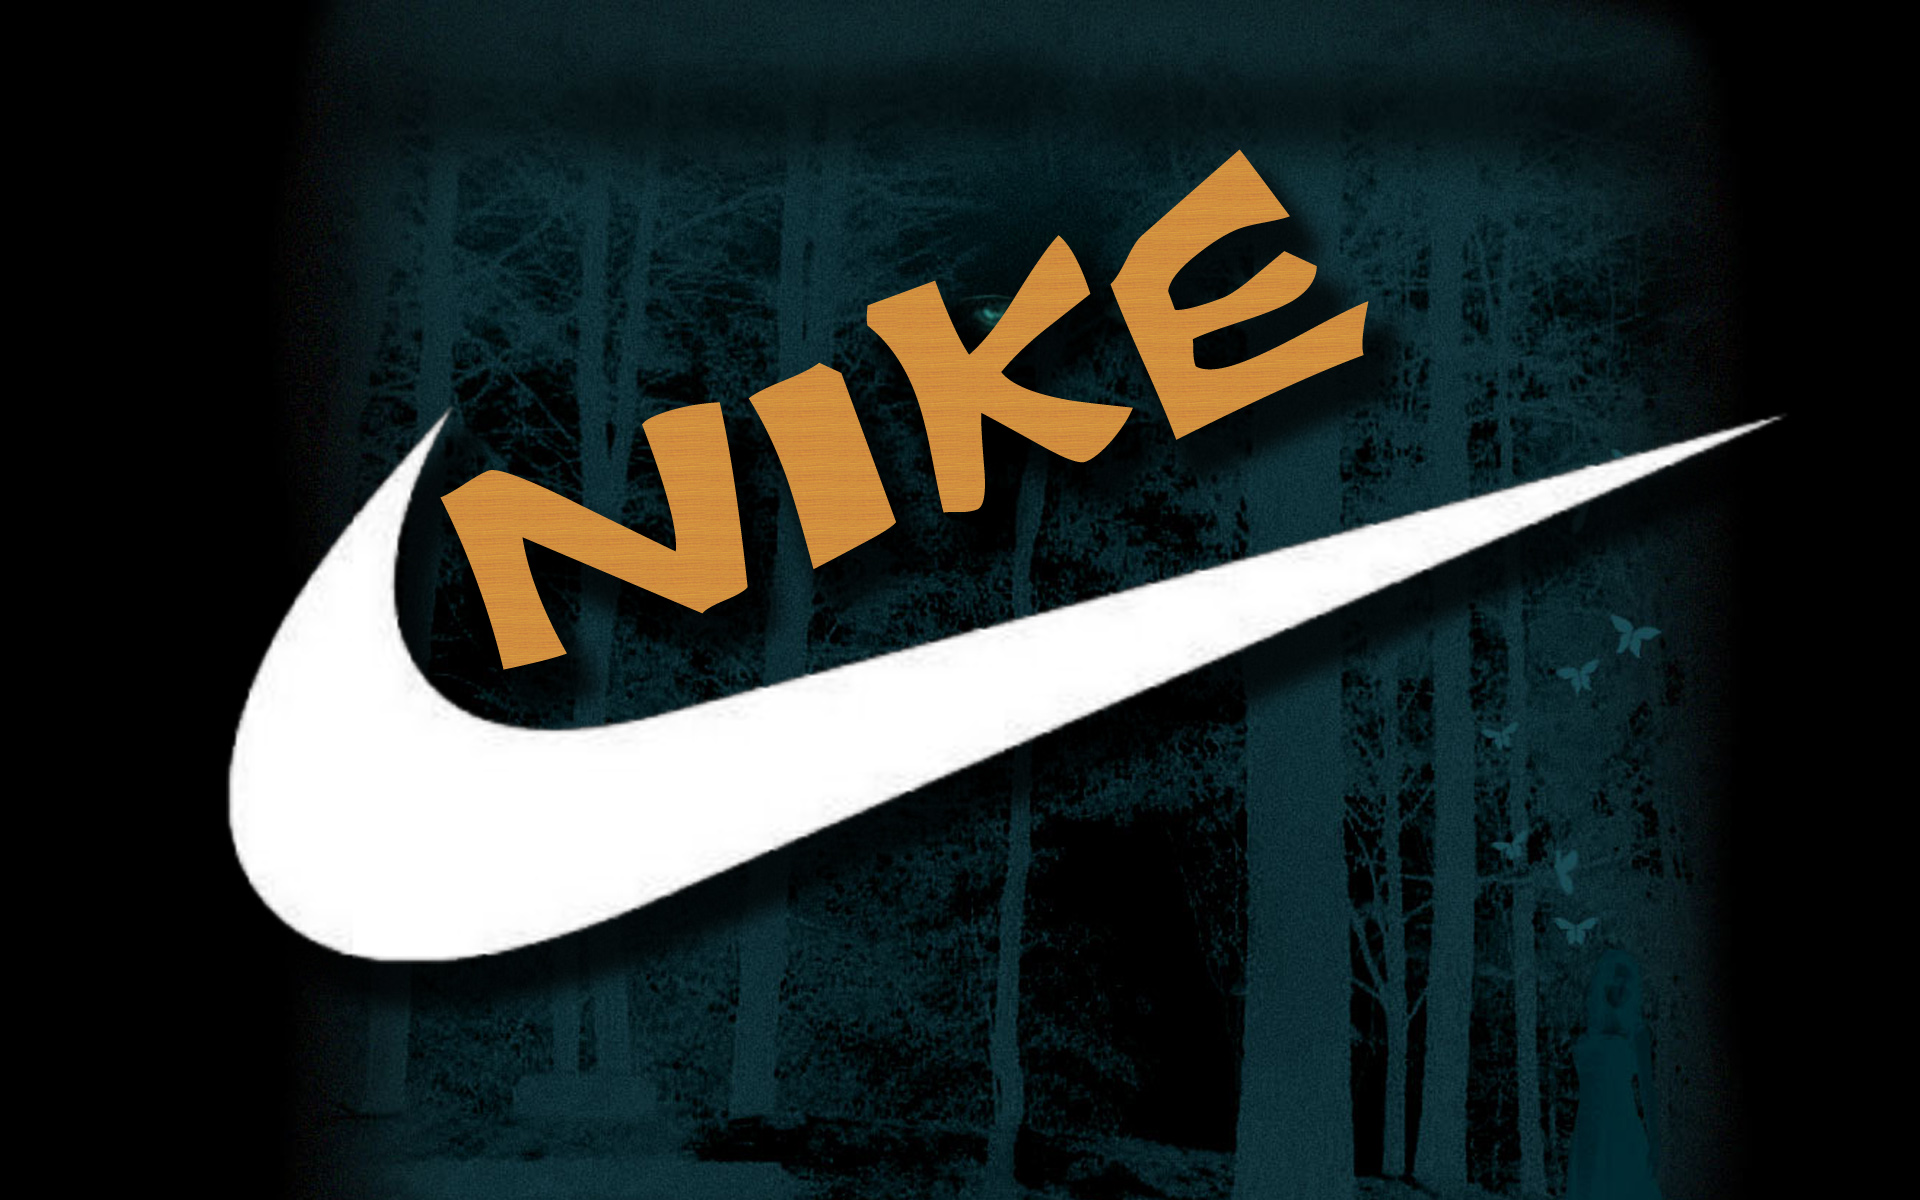 Logo nike wallpaper wallpapersafari - Nike Logo Cool Hd Wallpaper Download Wallpapers Page